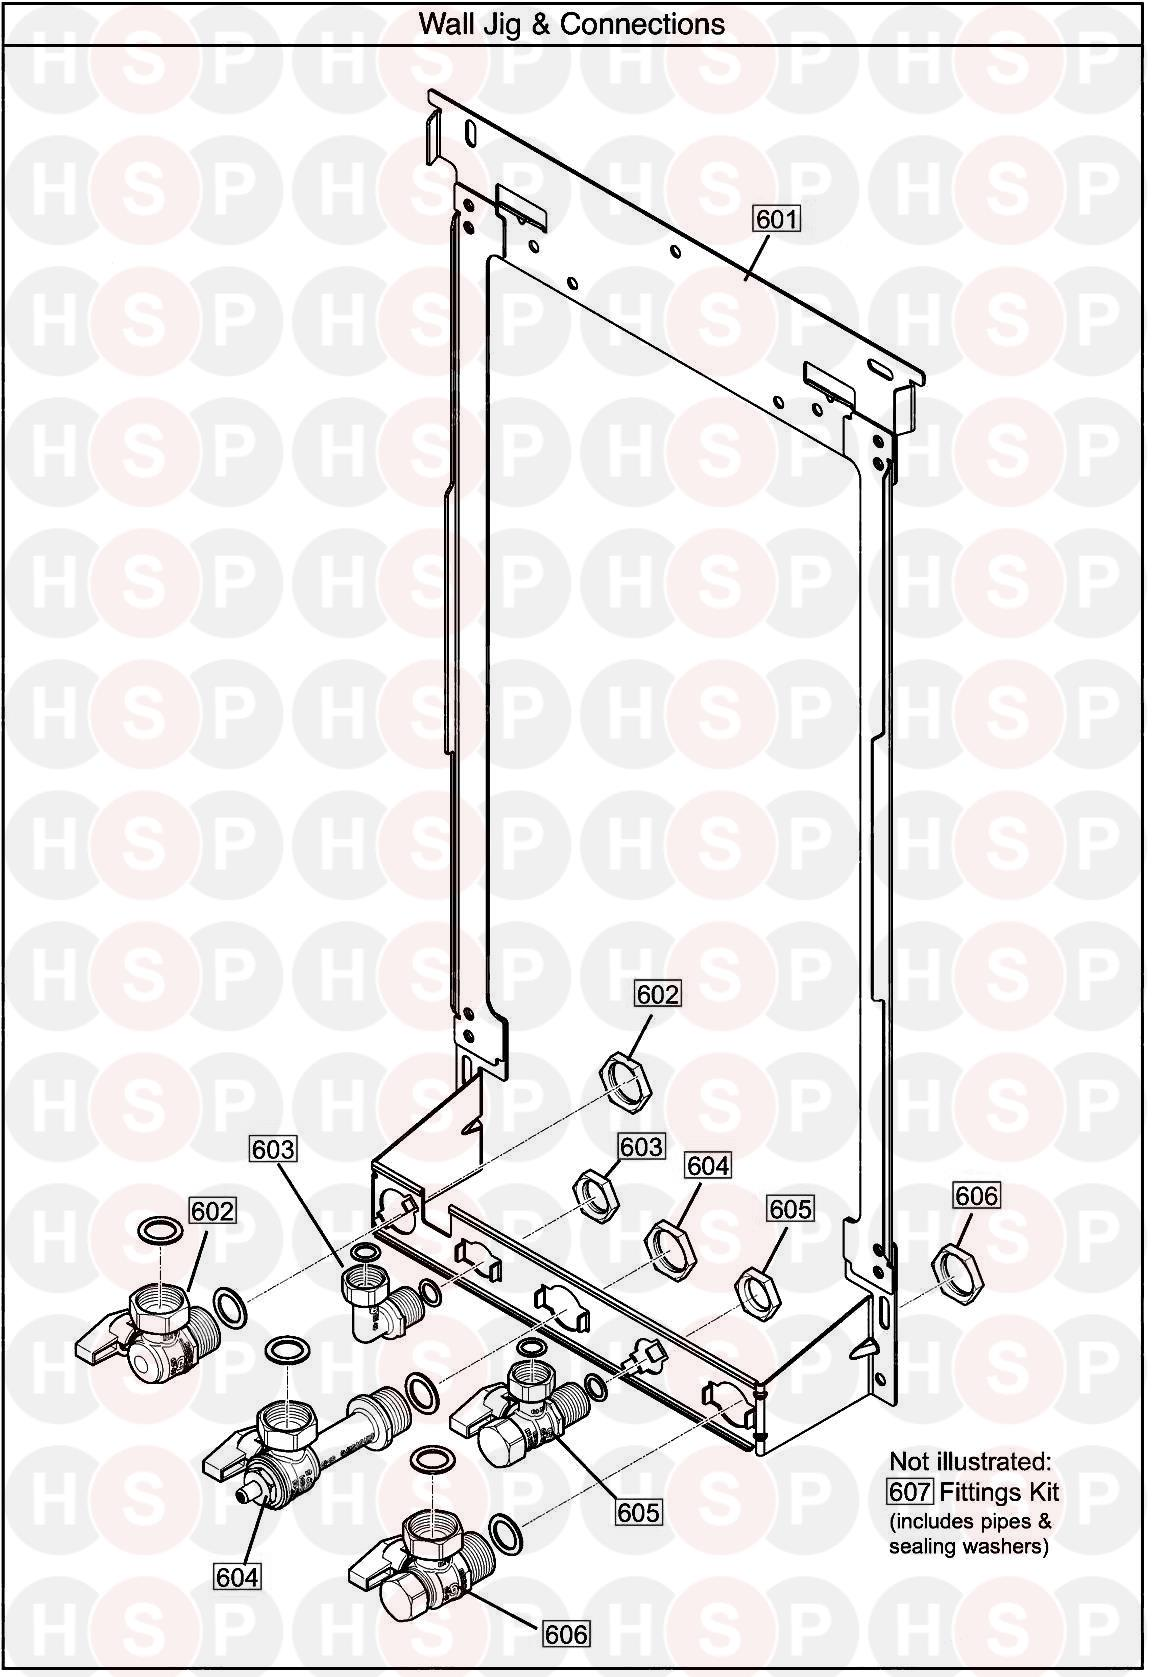 baxi ecoblue 24 combi appliance diagram  wall jig